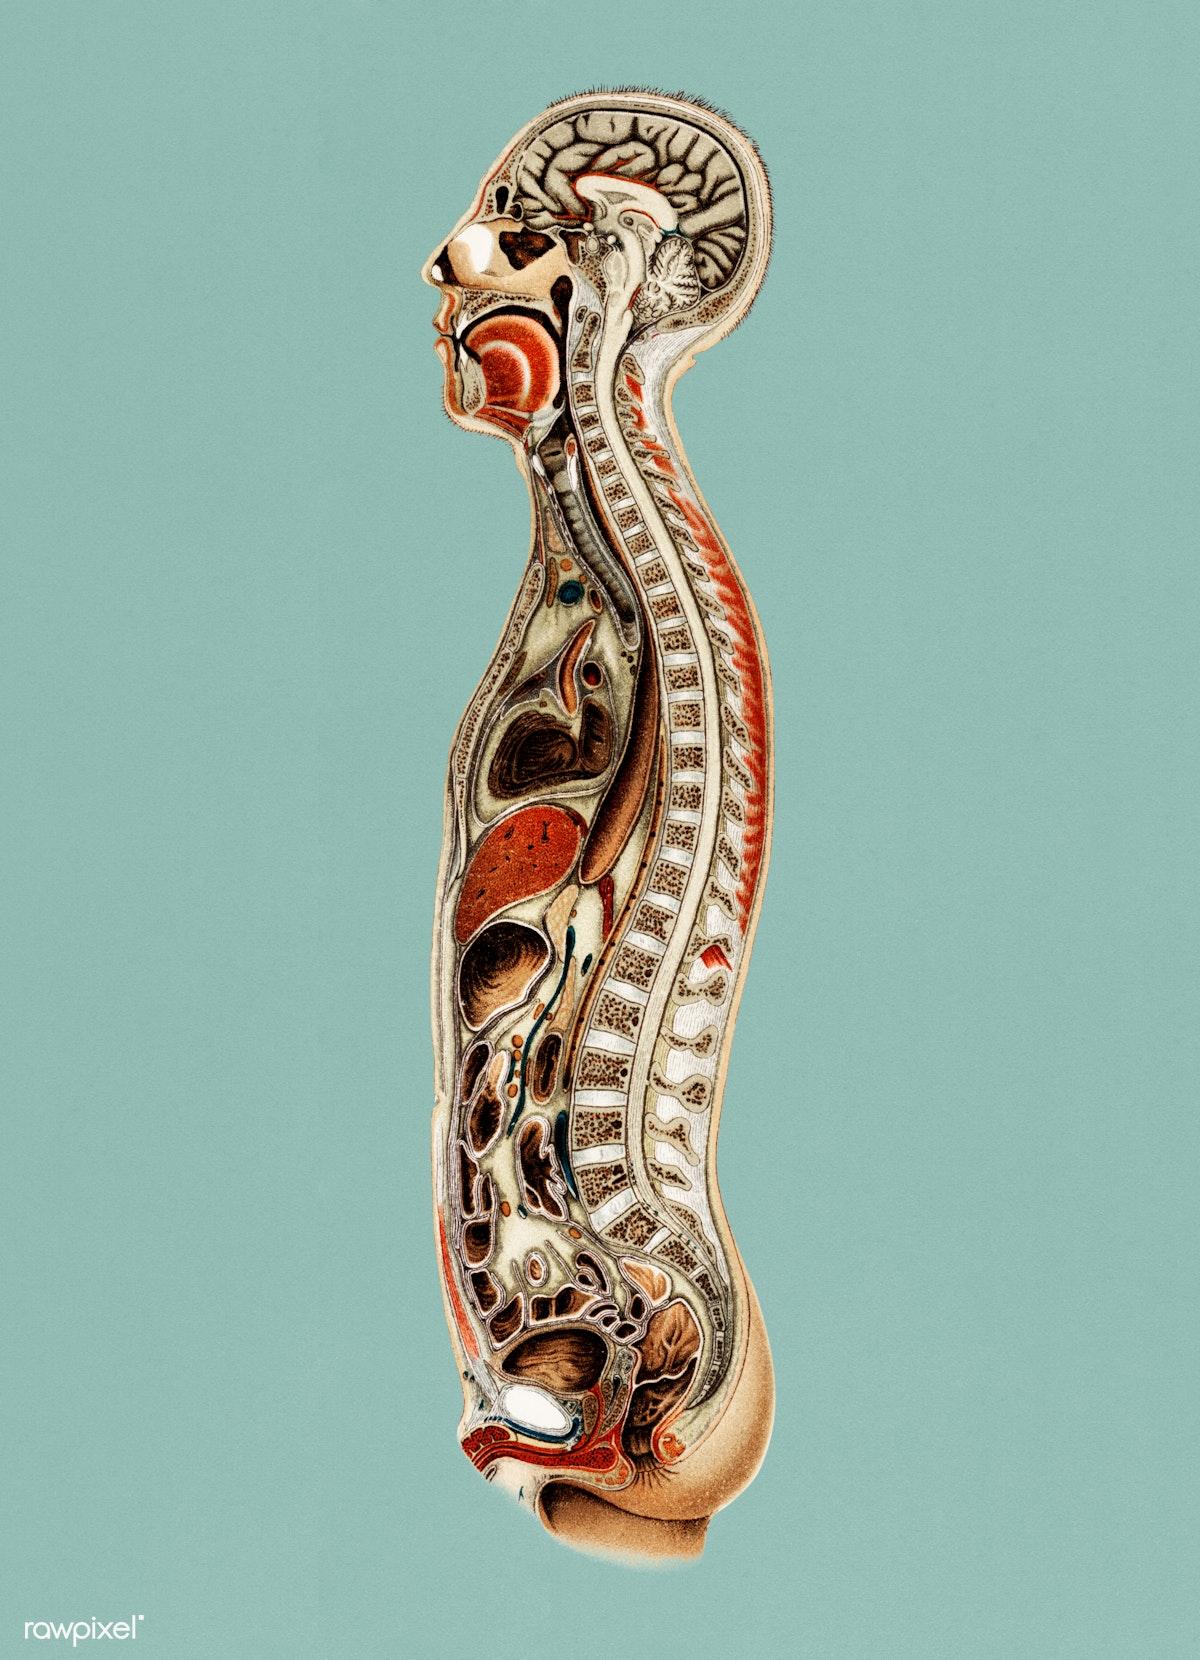 Download Premium Illustration Of Vintage Illustration Of An Anatomy Chart